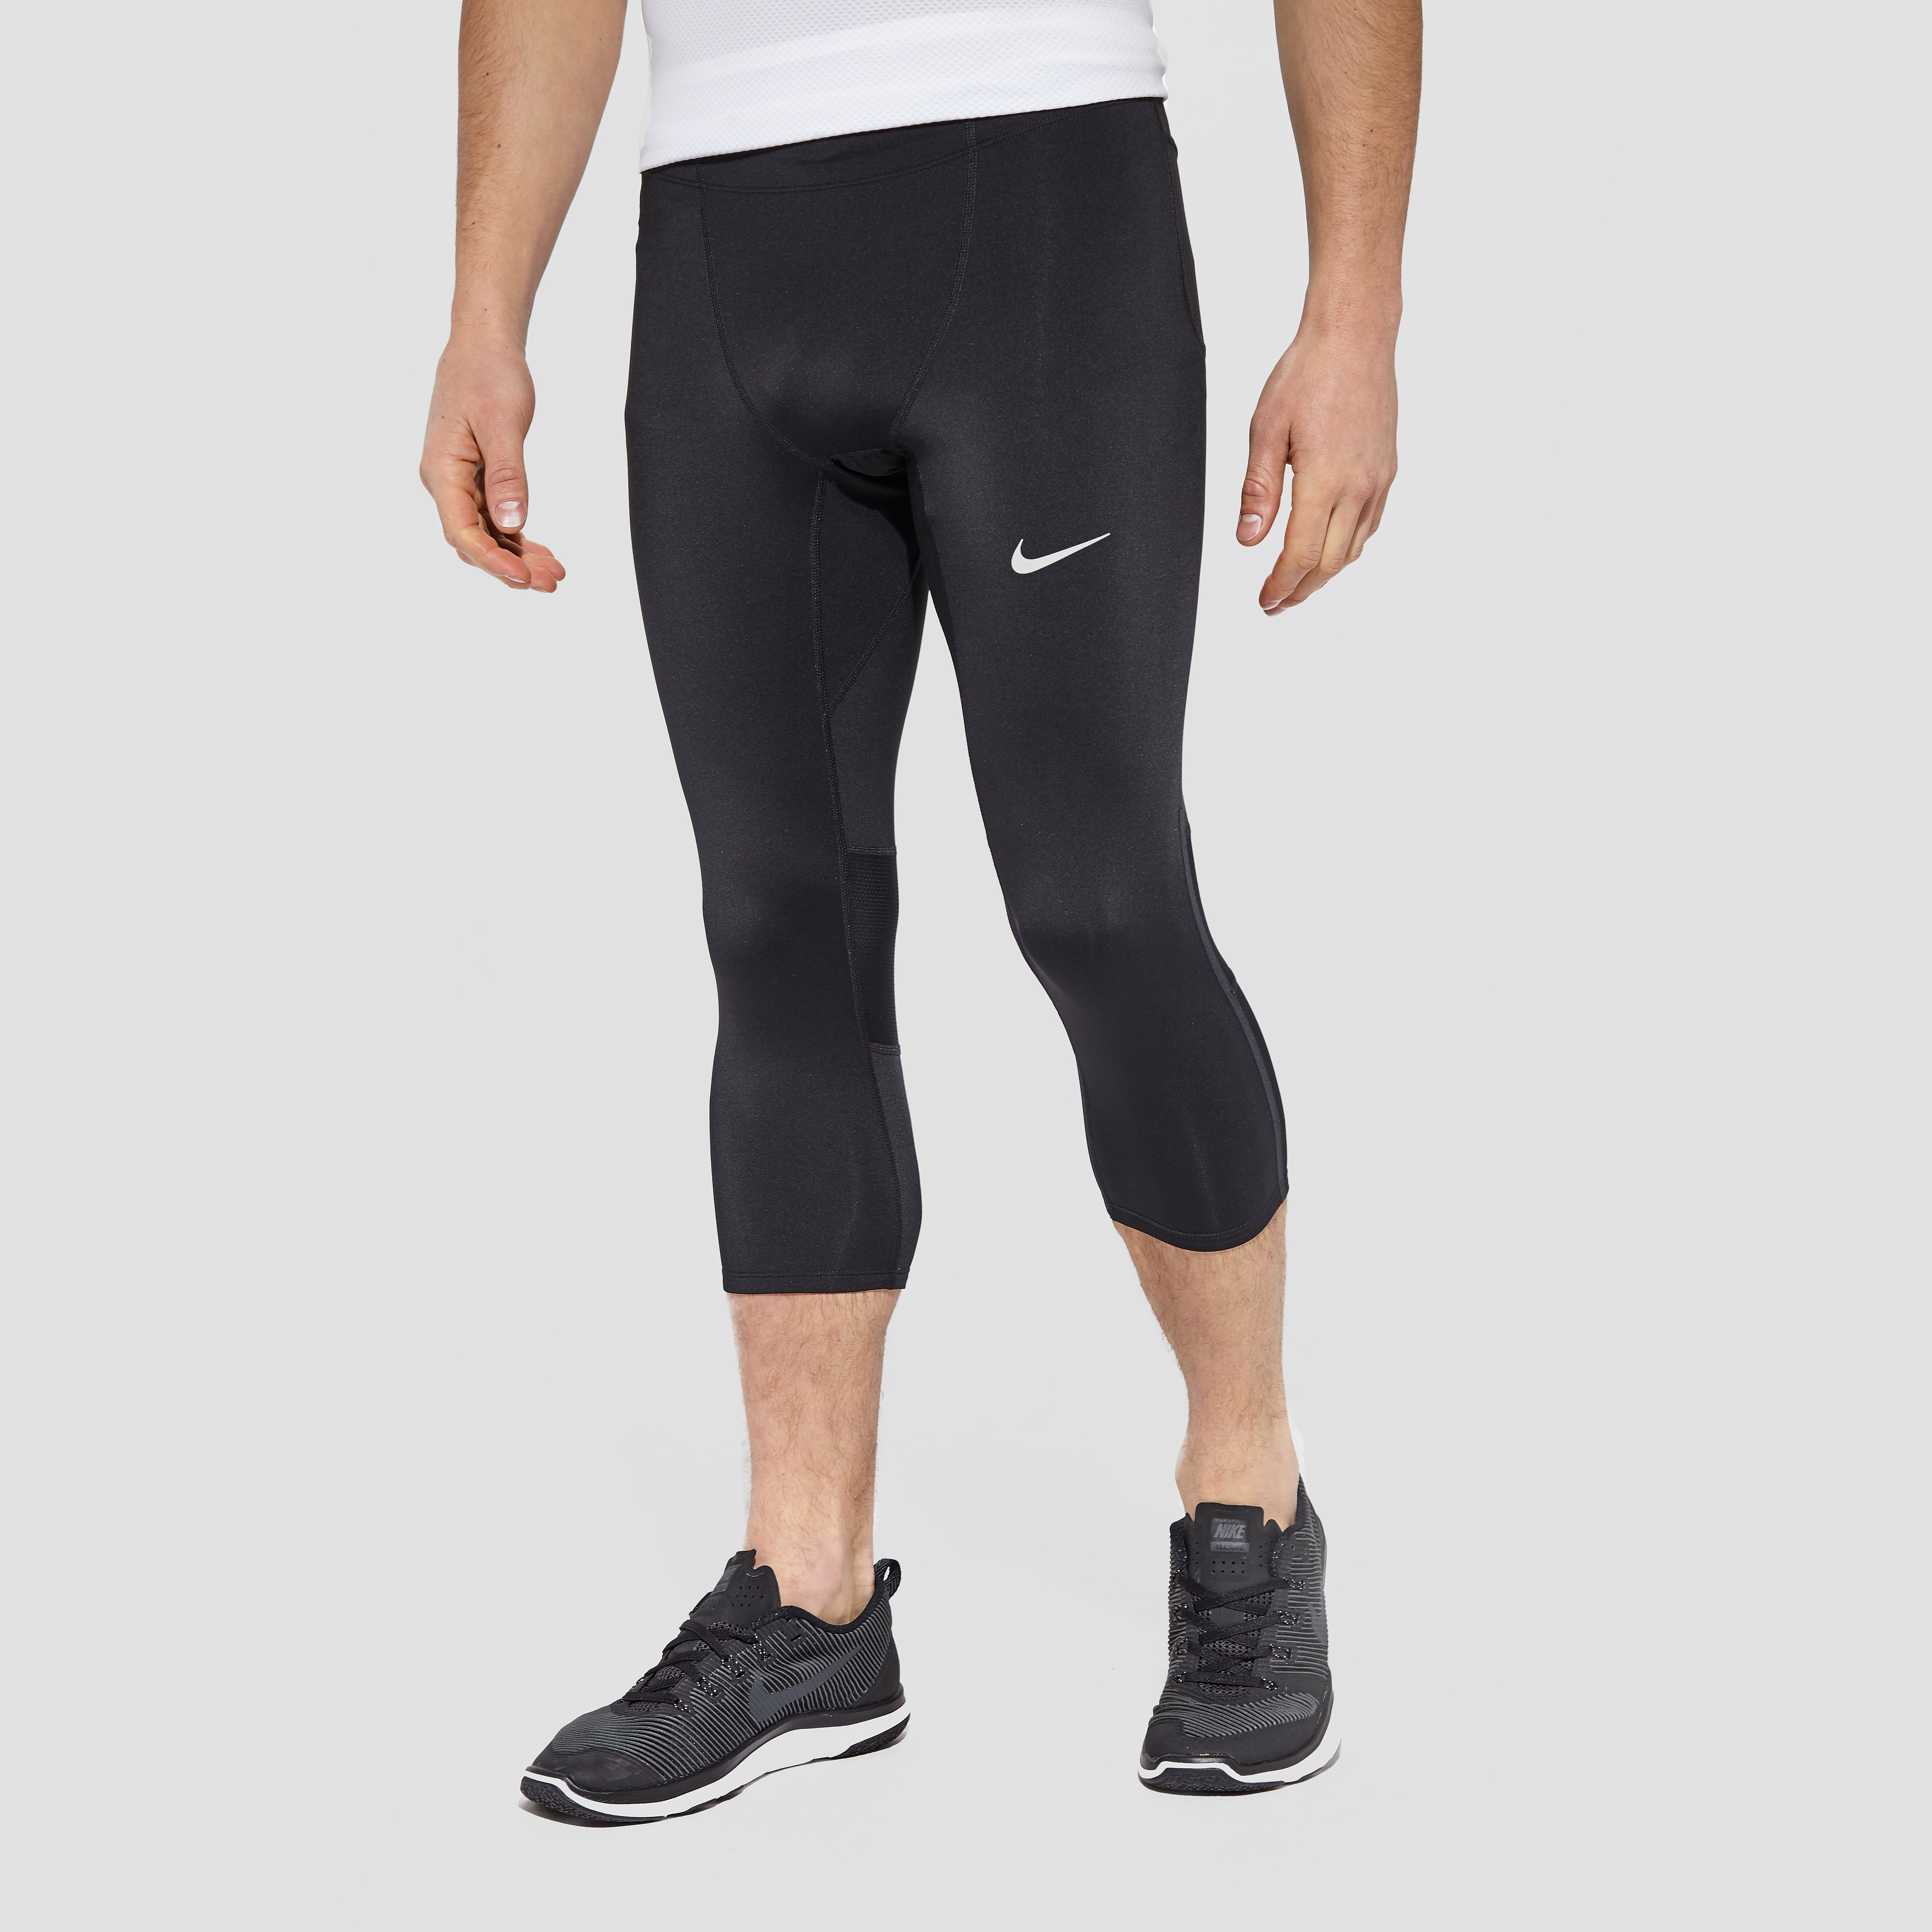 Nike Nike Men's Tech Three-Quarter Tights